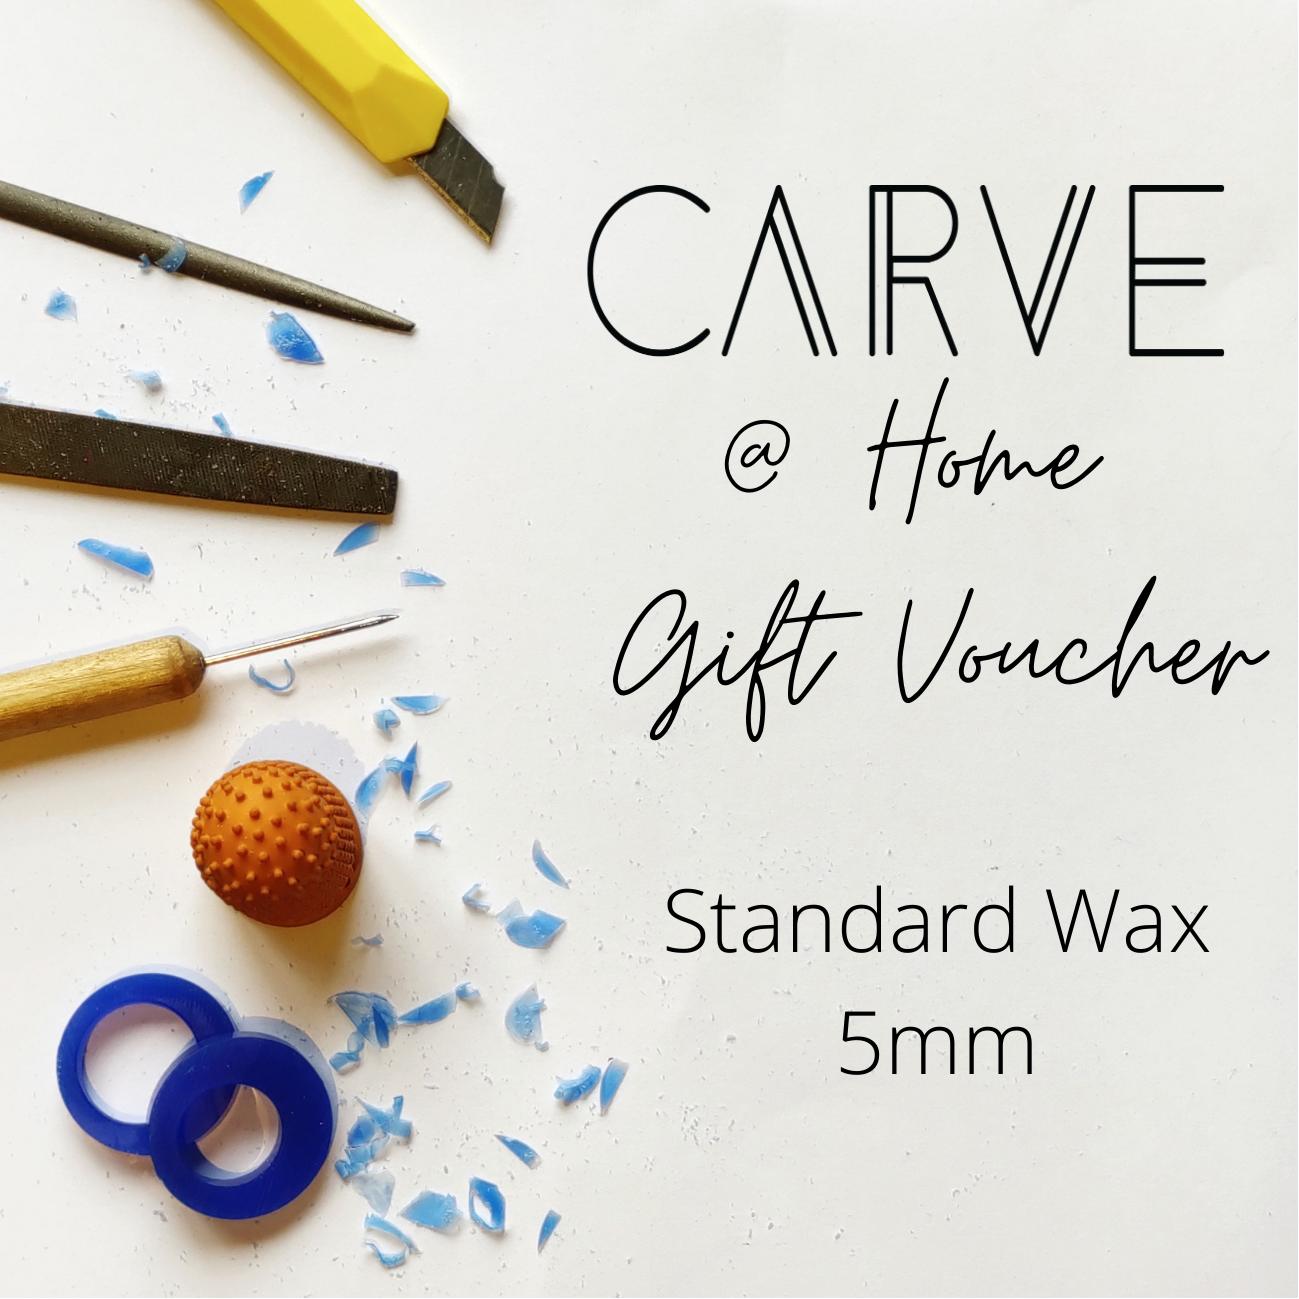 Carve @ Home Gift Voucher Standard 5mm wax